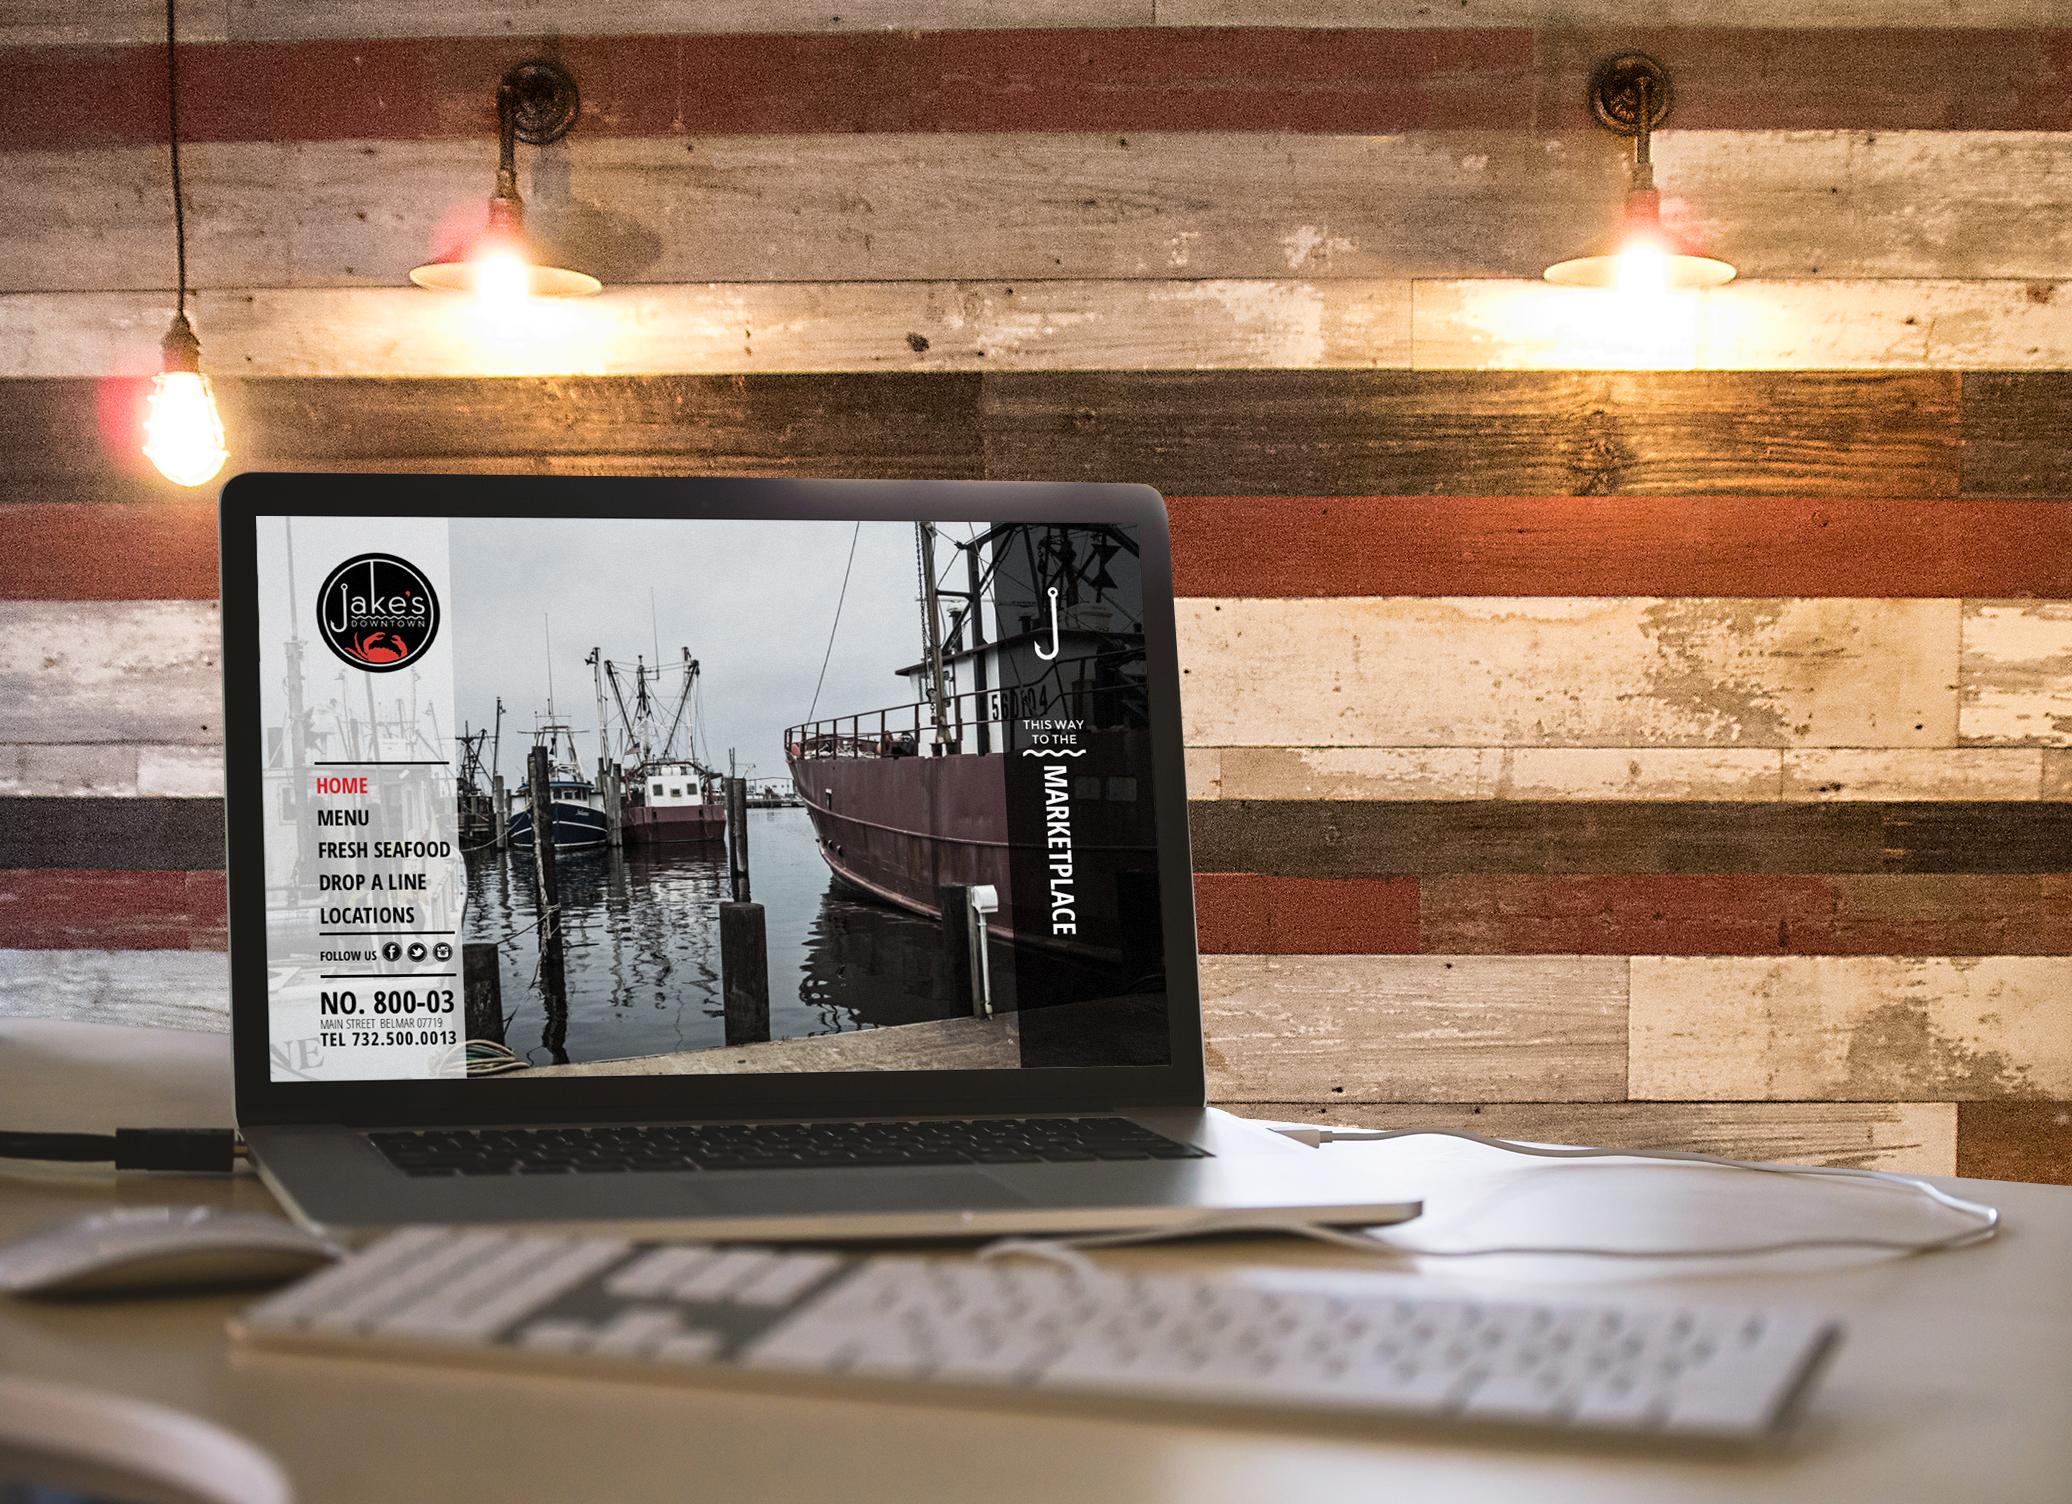 grass-creative-branding-design-jakes-restaurant-menu-NYC-NJ-website.jpg